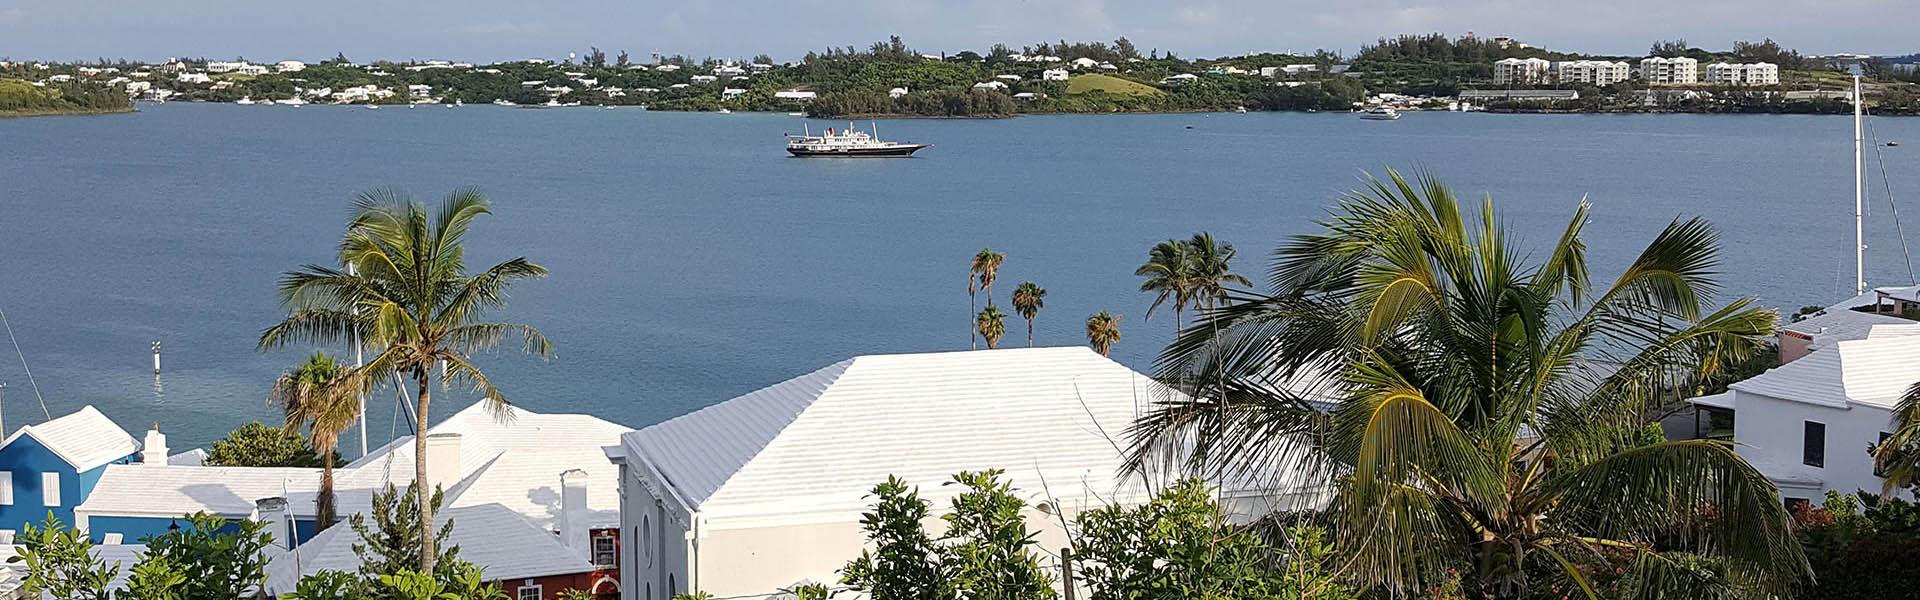 Bermuda_Asset_banner